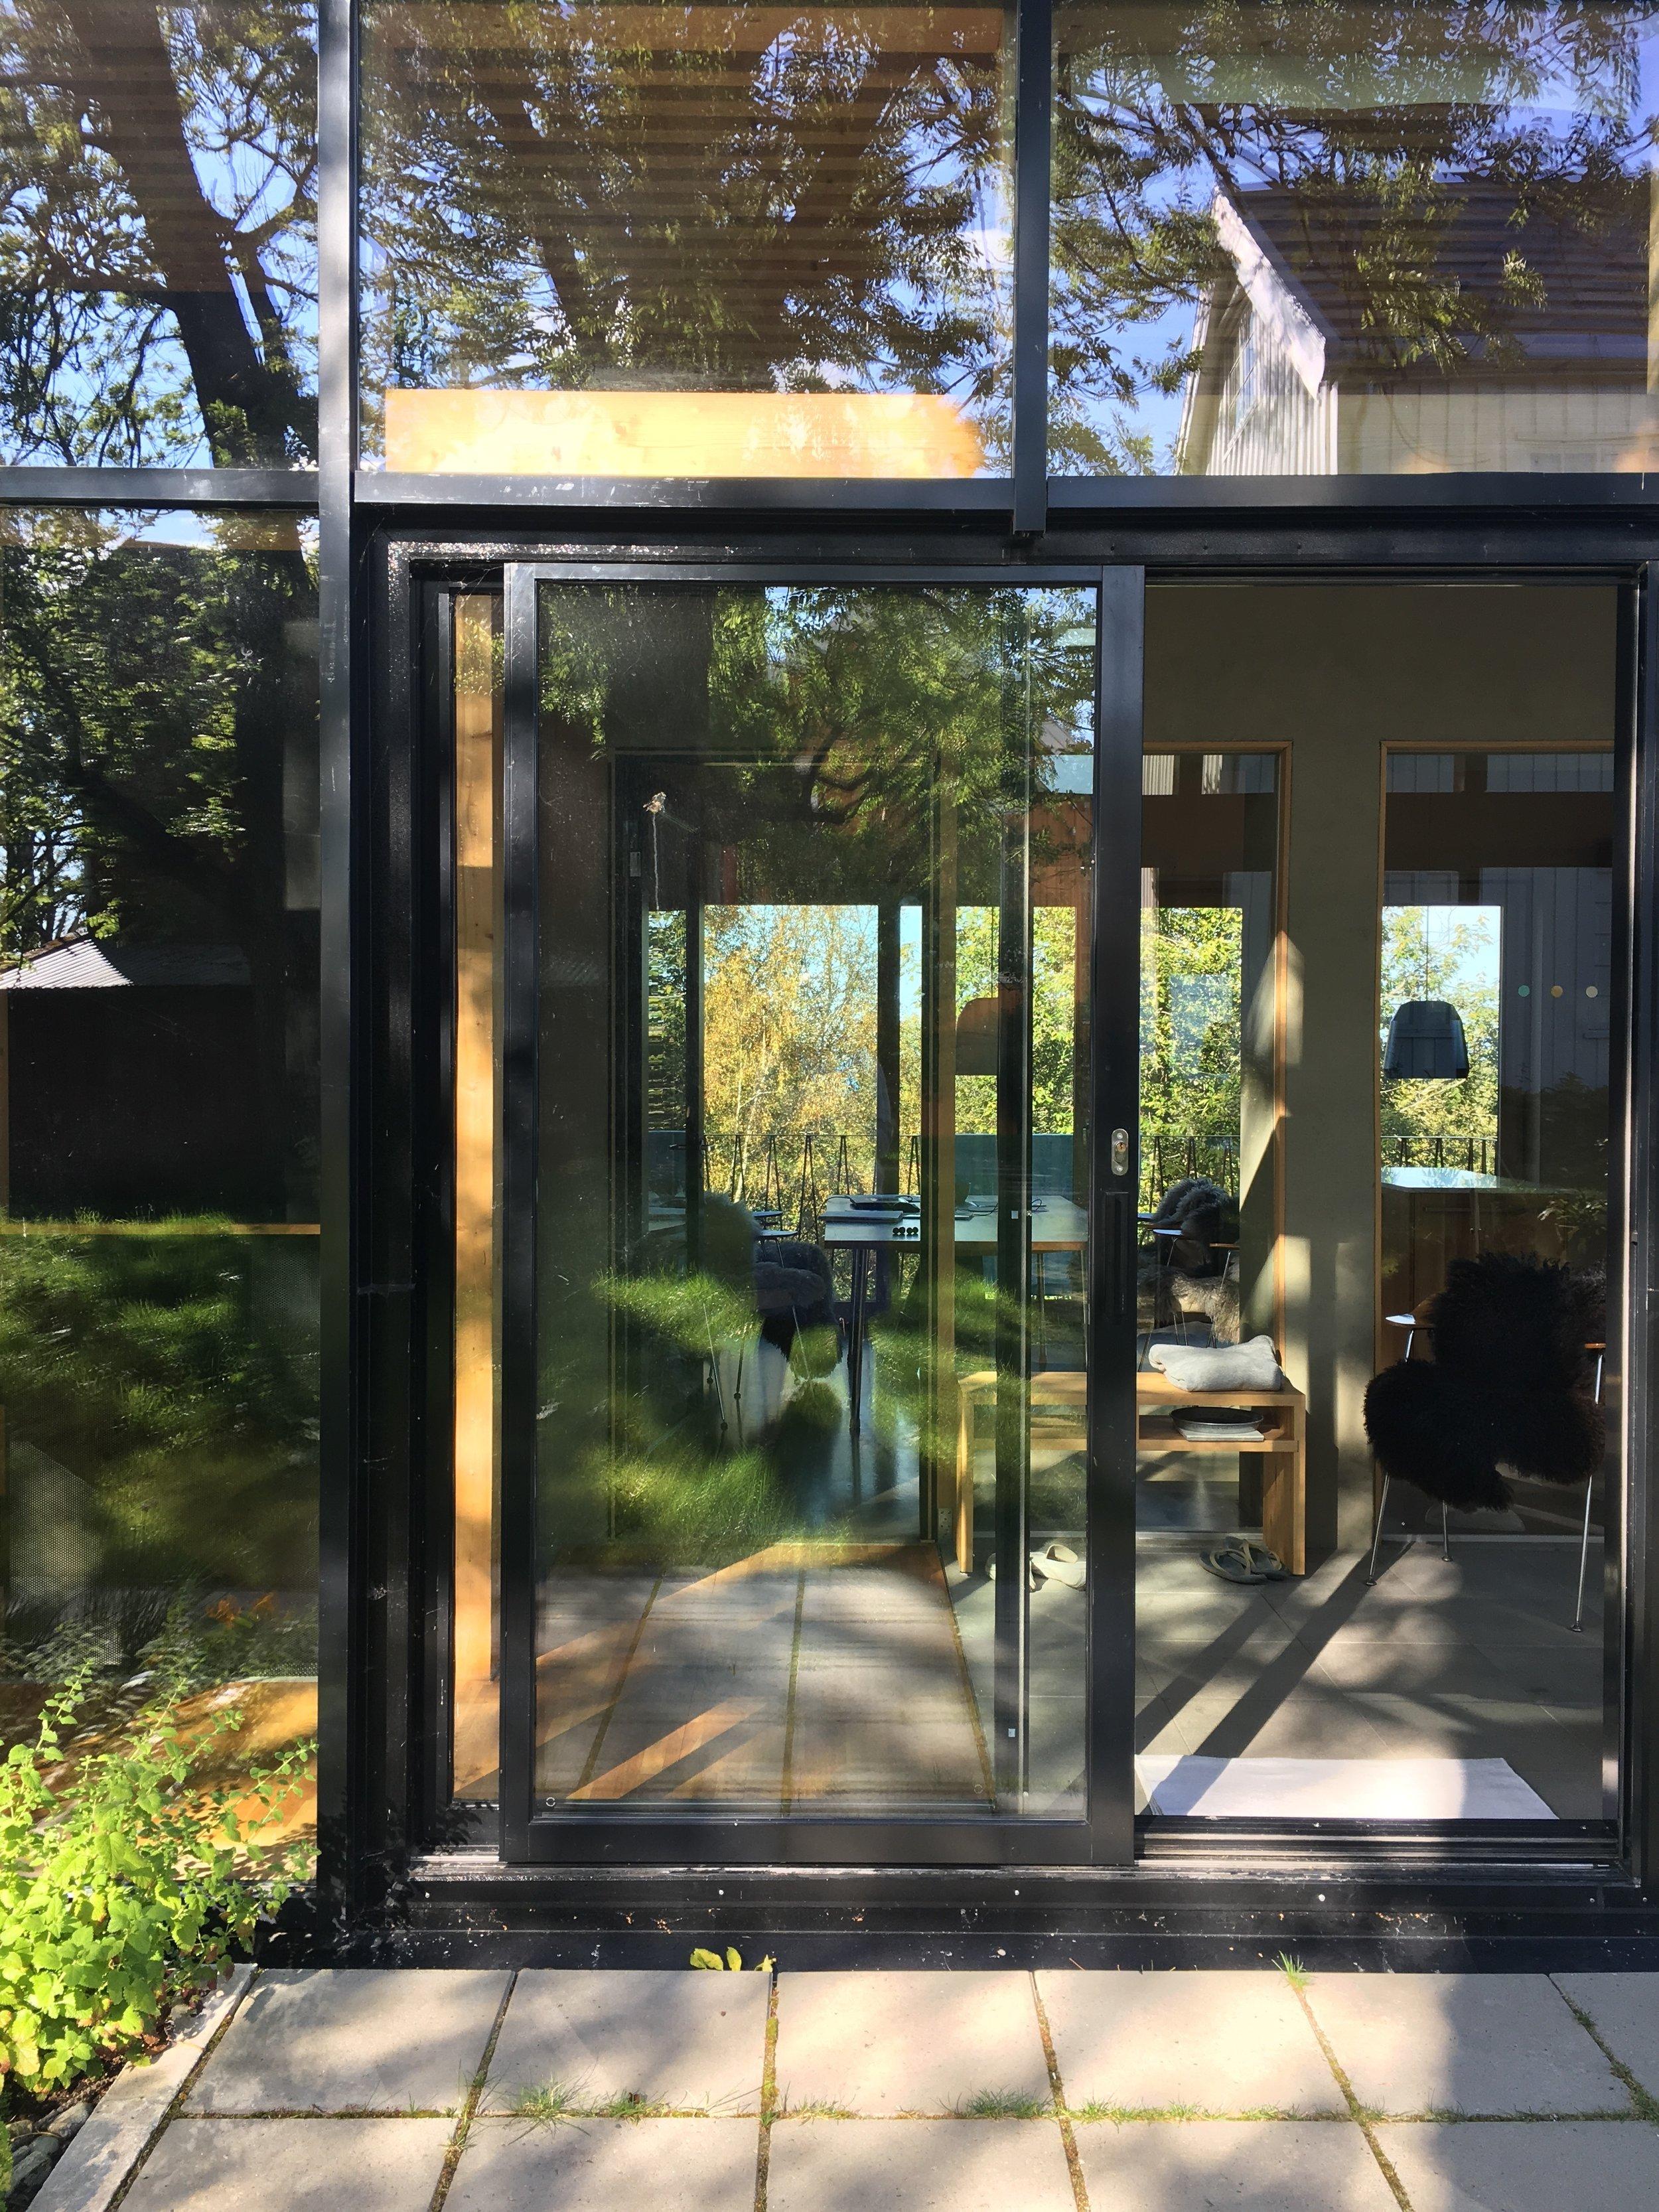 Den kvite Trønder-låna speiler seg sammen med aske-trærne i Årstidshus-fasaden.